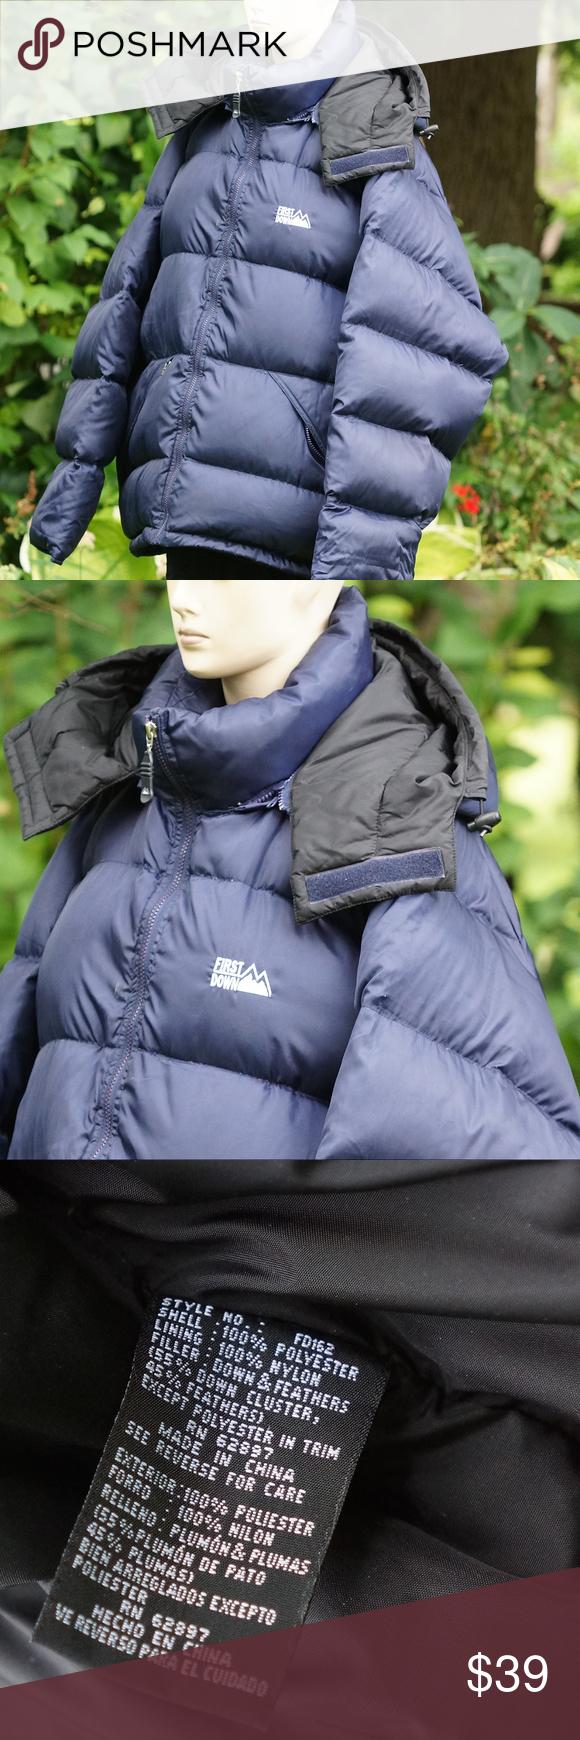 Mens Xxl Puffer Goose Down Winter Coat Blue Blue Winter Coat Down Winter Coats Winter Puffer Jackets [ 1740 x 580 Pixel ]